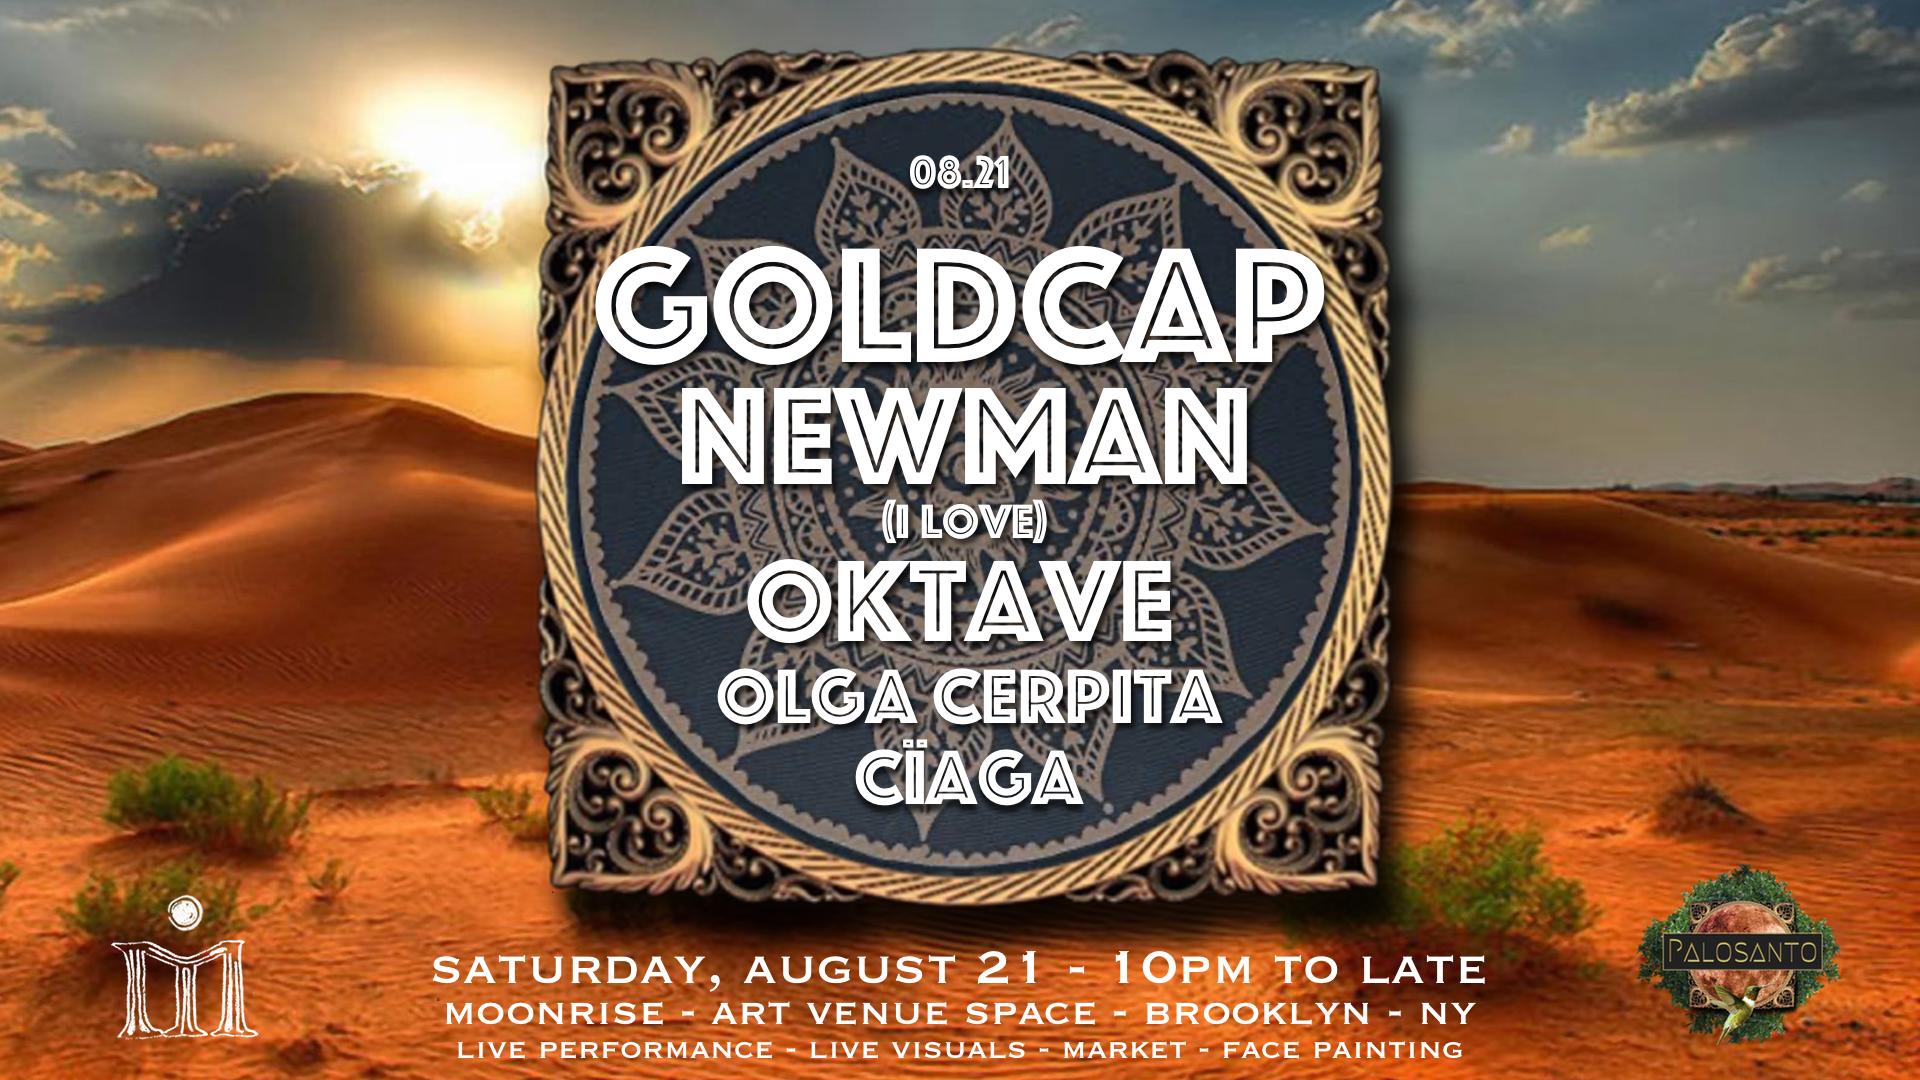 Palosanto w/ GOLDCAP, Newman (I Love), Oktave, Olga C & Cïaga